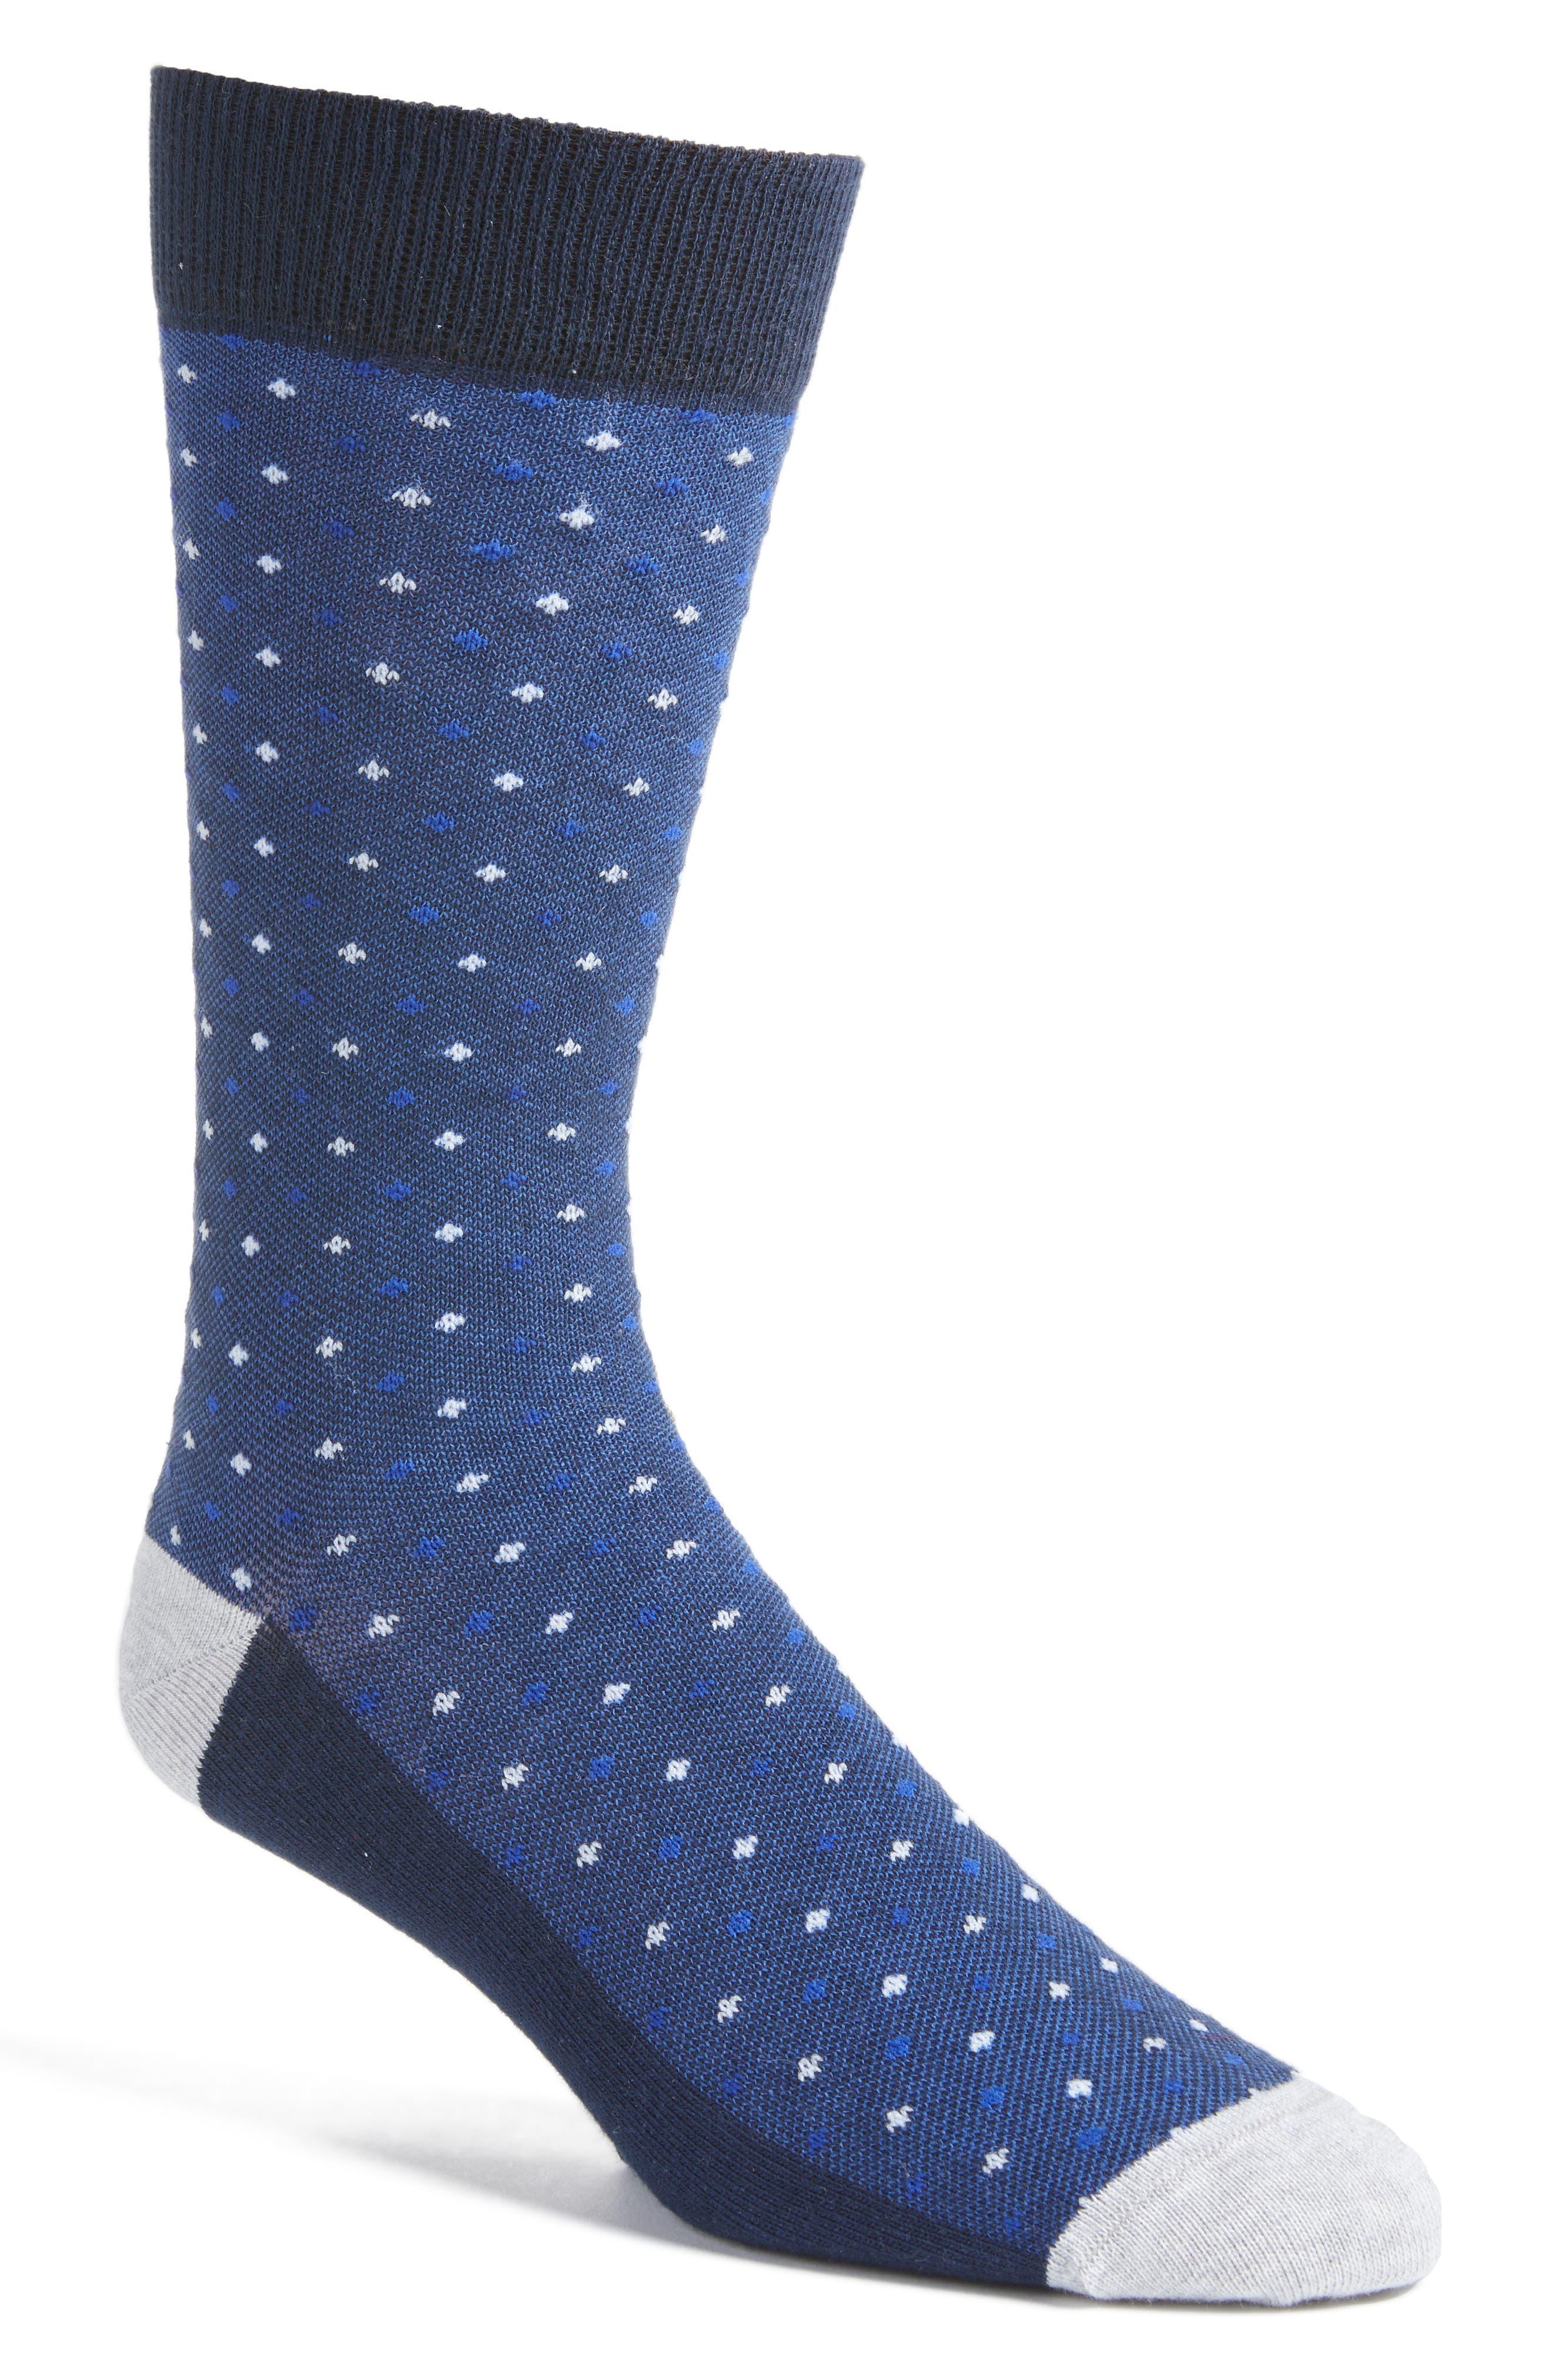 Bird's Eye Crew Socks,                         Main,                         color, Blue